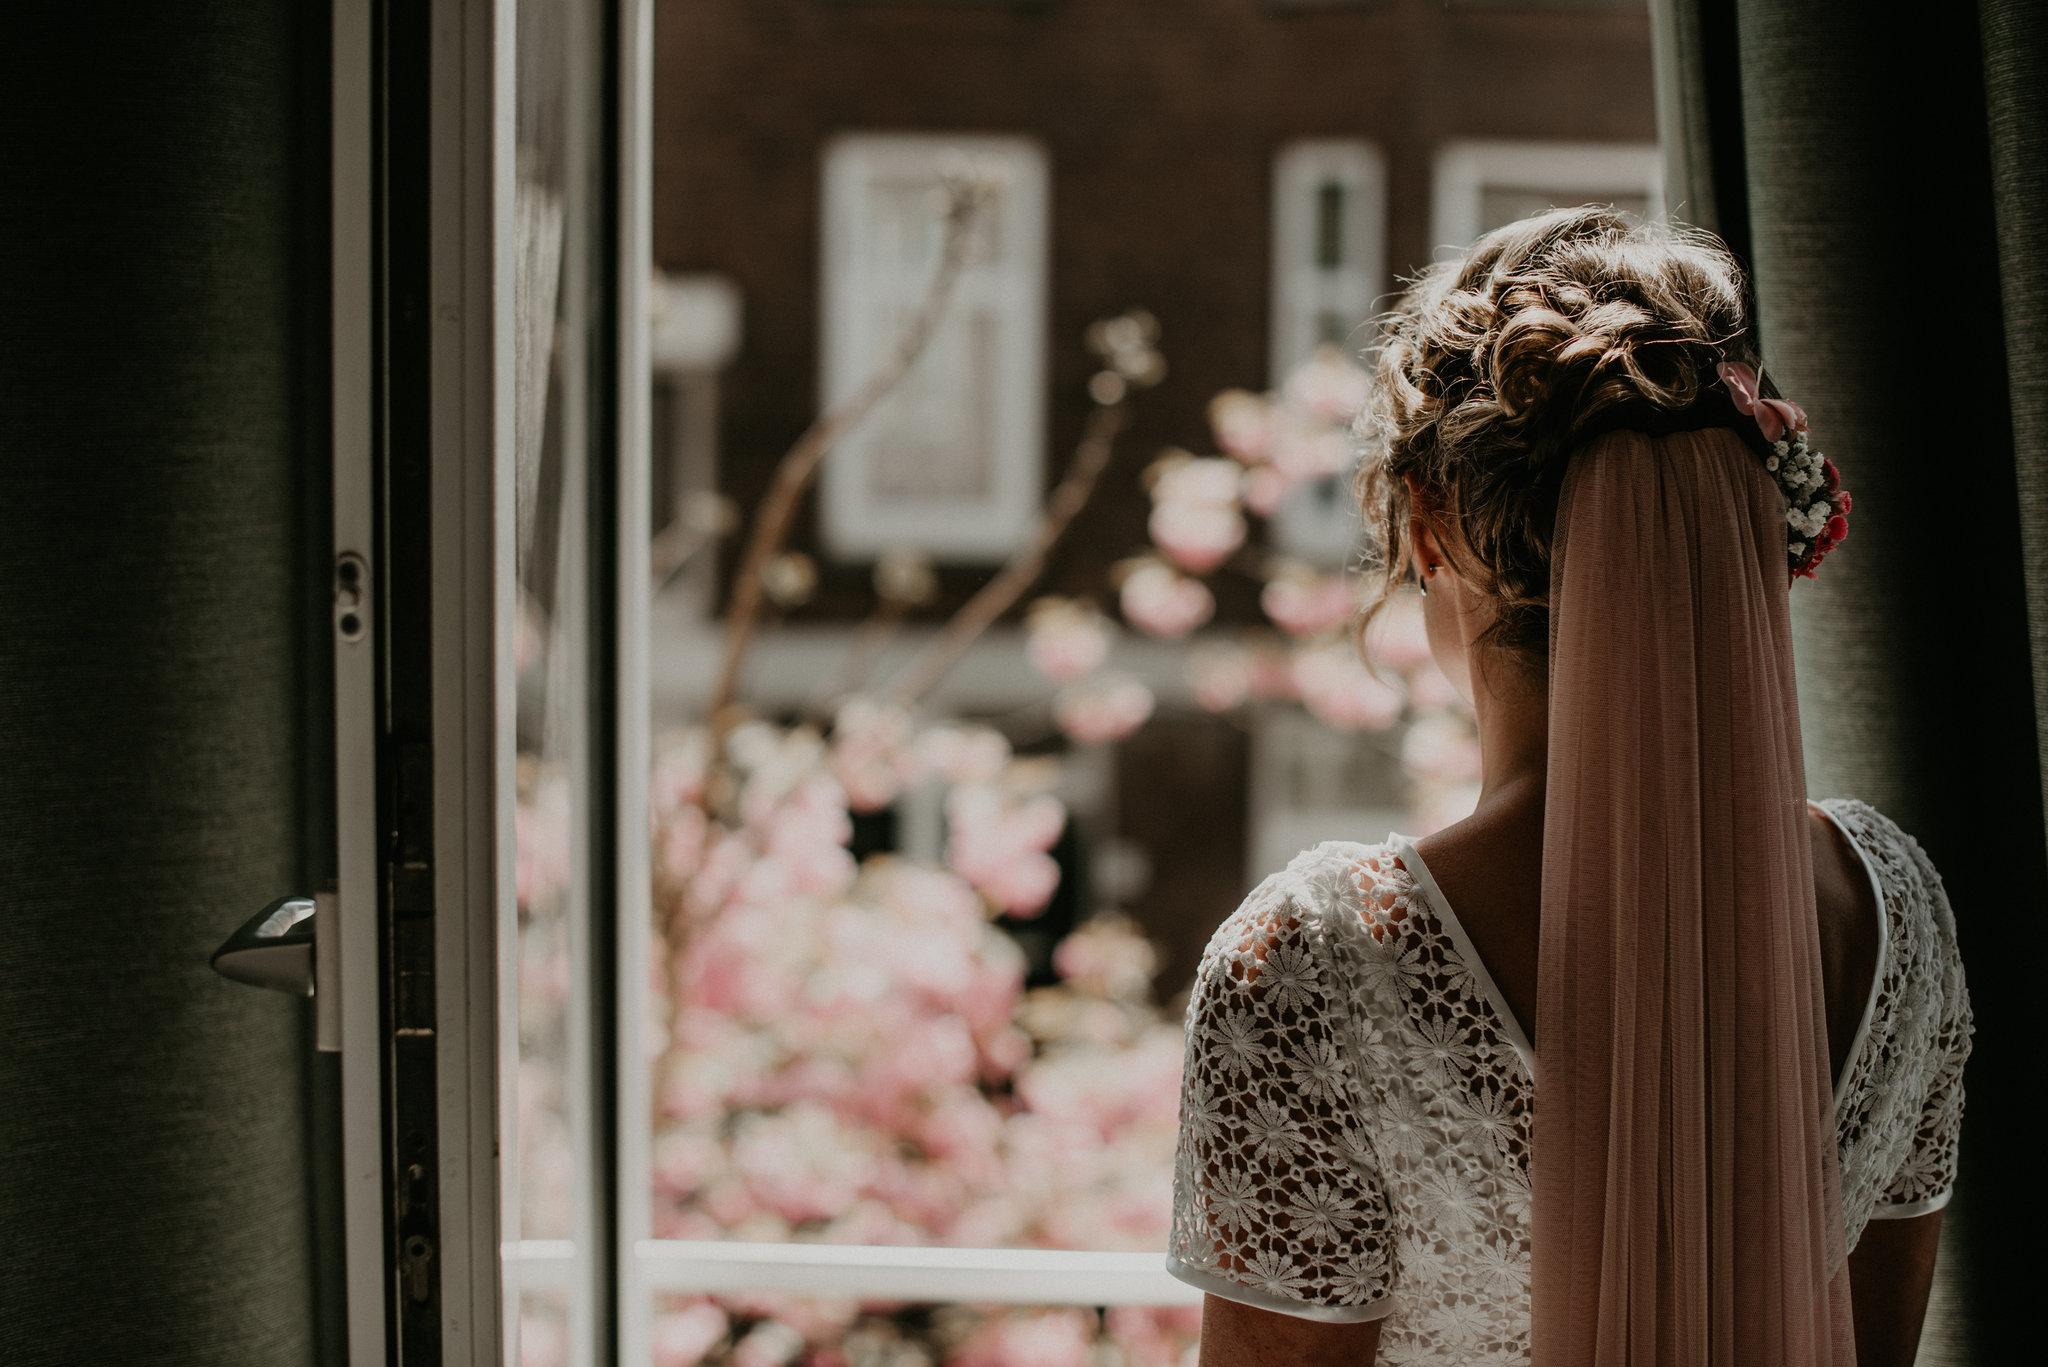 Rotterdam bride looking our her bedroom window looking for her groom